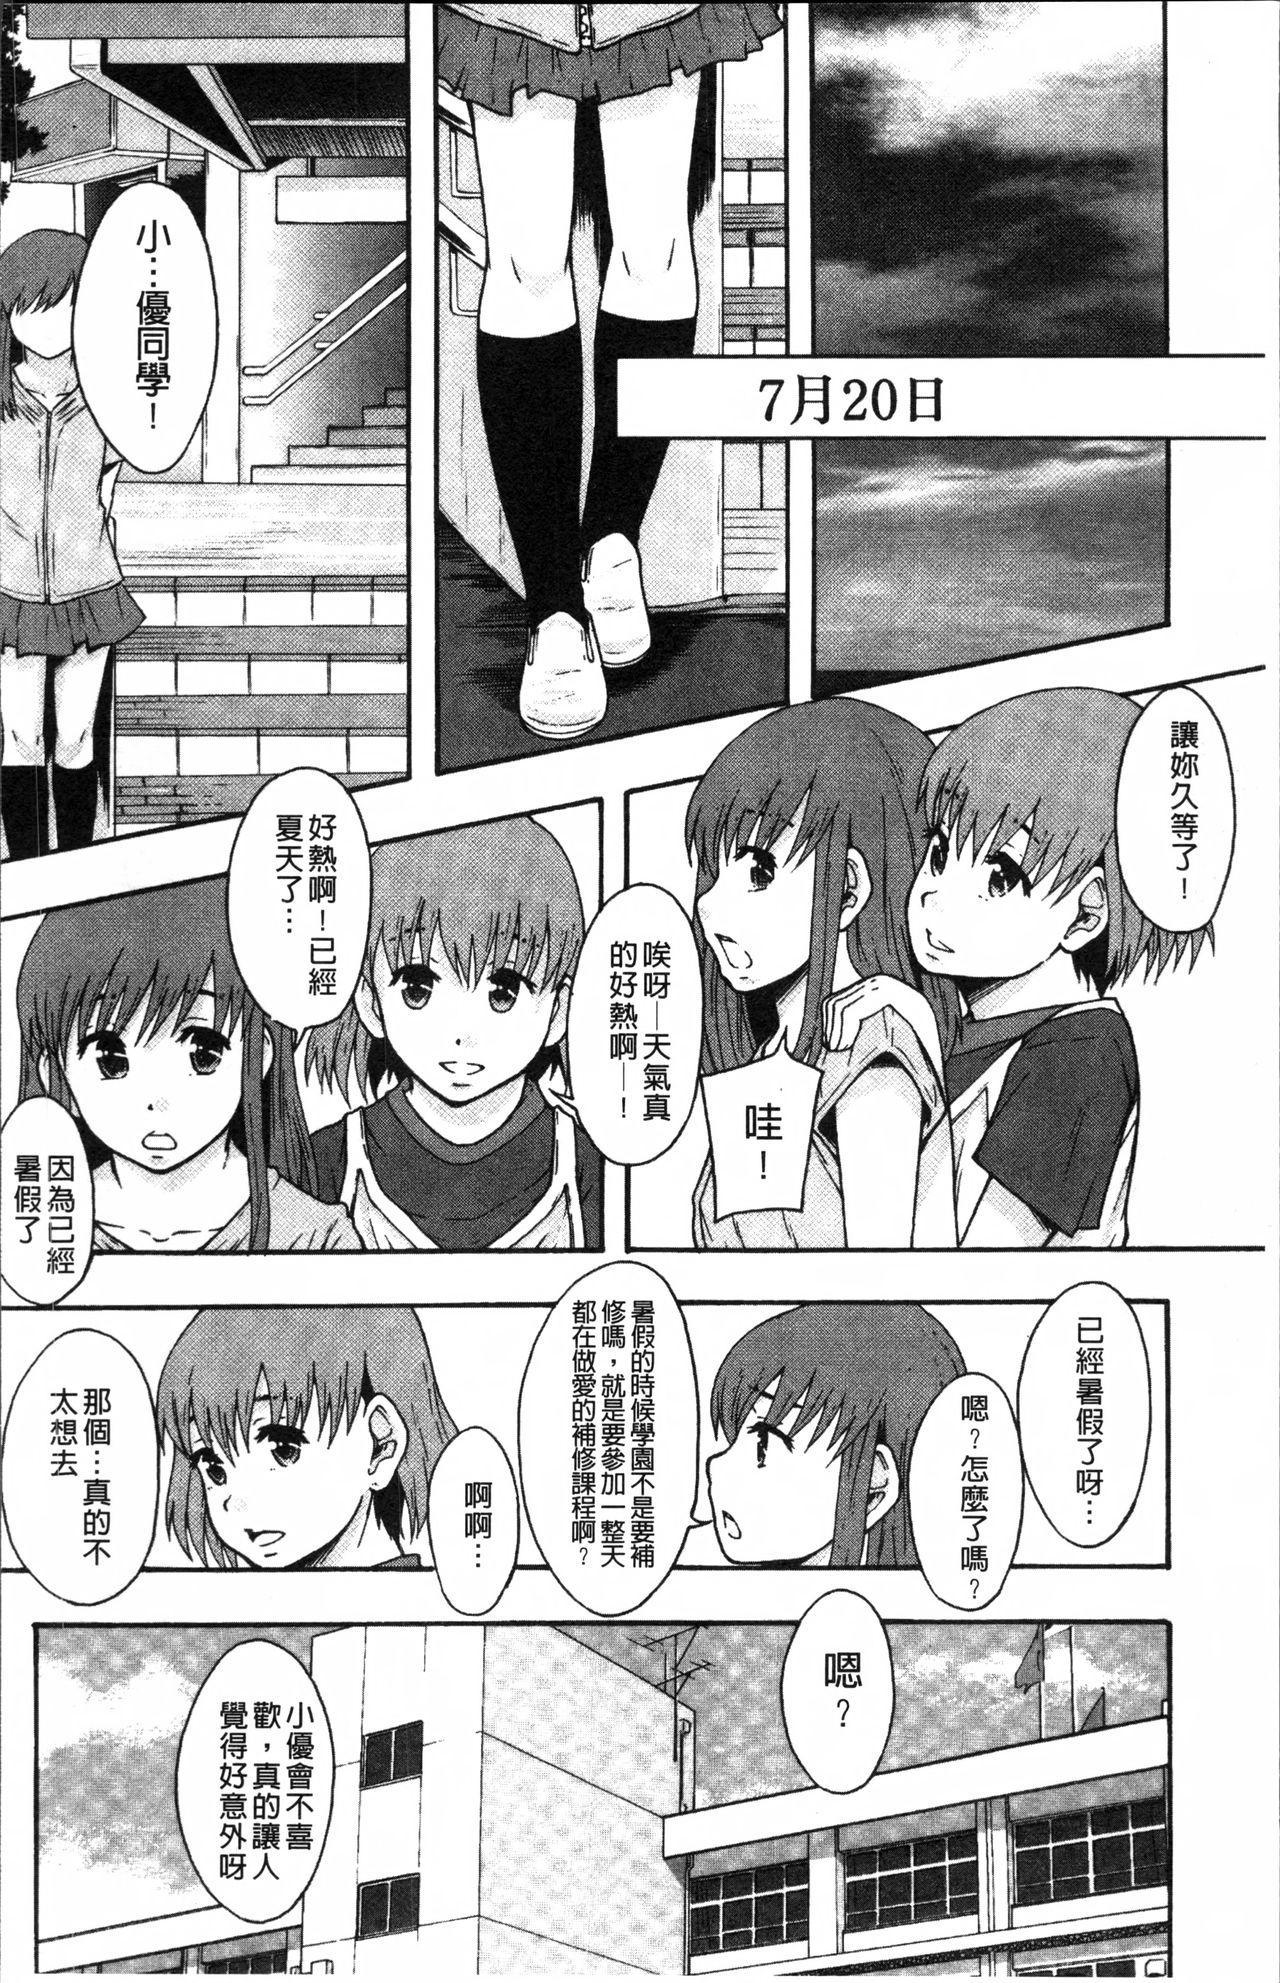 Anoko no Class wa AV-ka 80